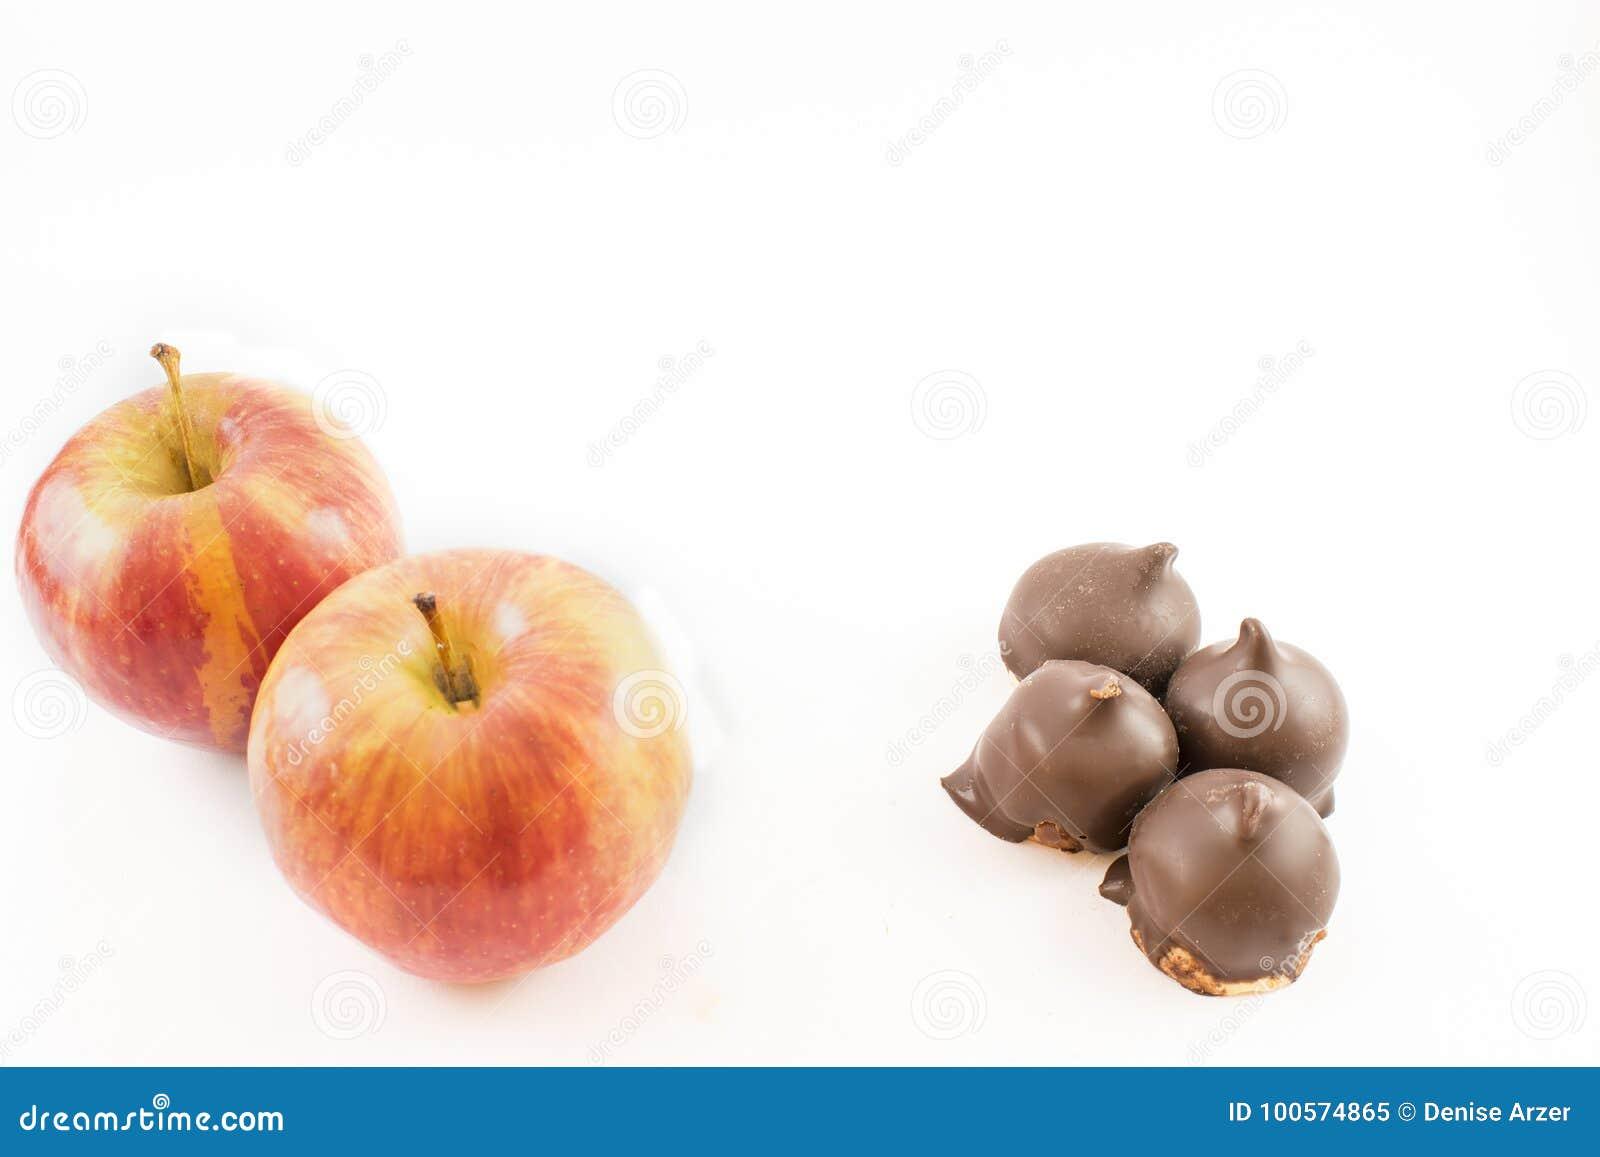 Apple y dulce de leche